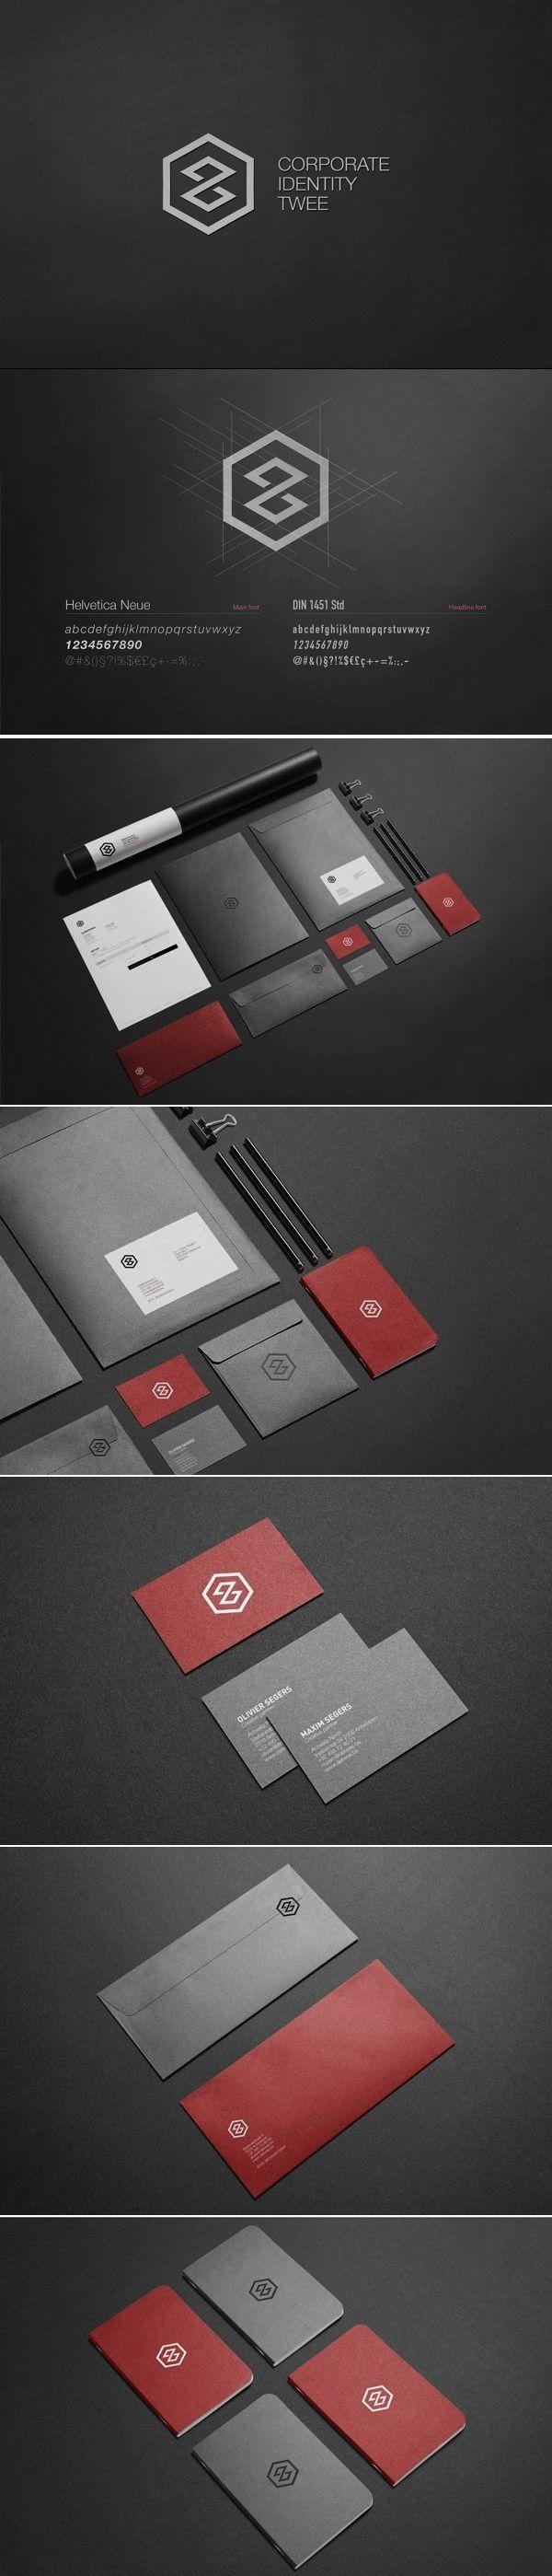 Twee Corporate Identity and Logo Design.